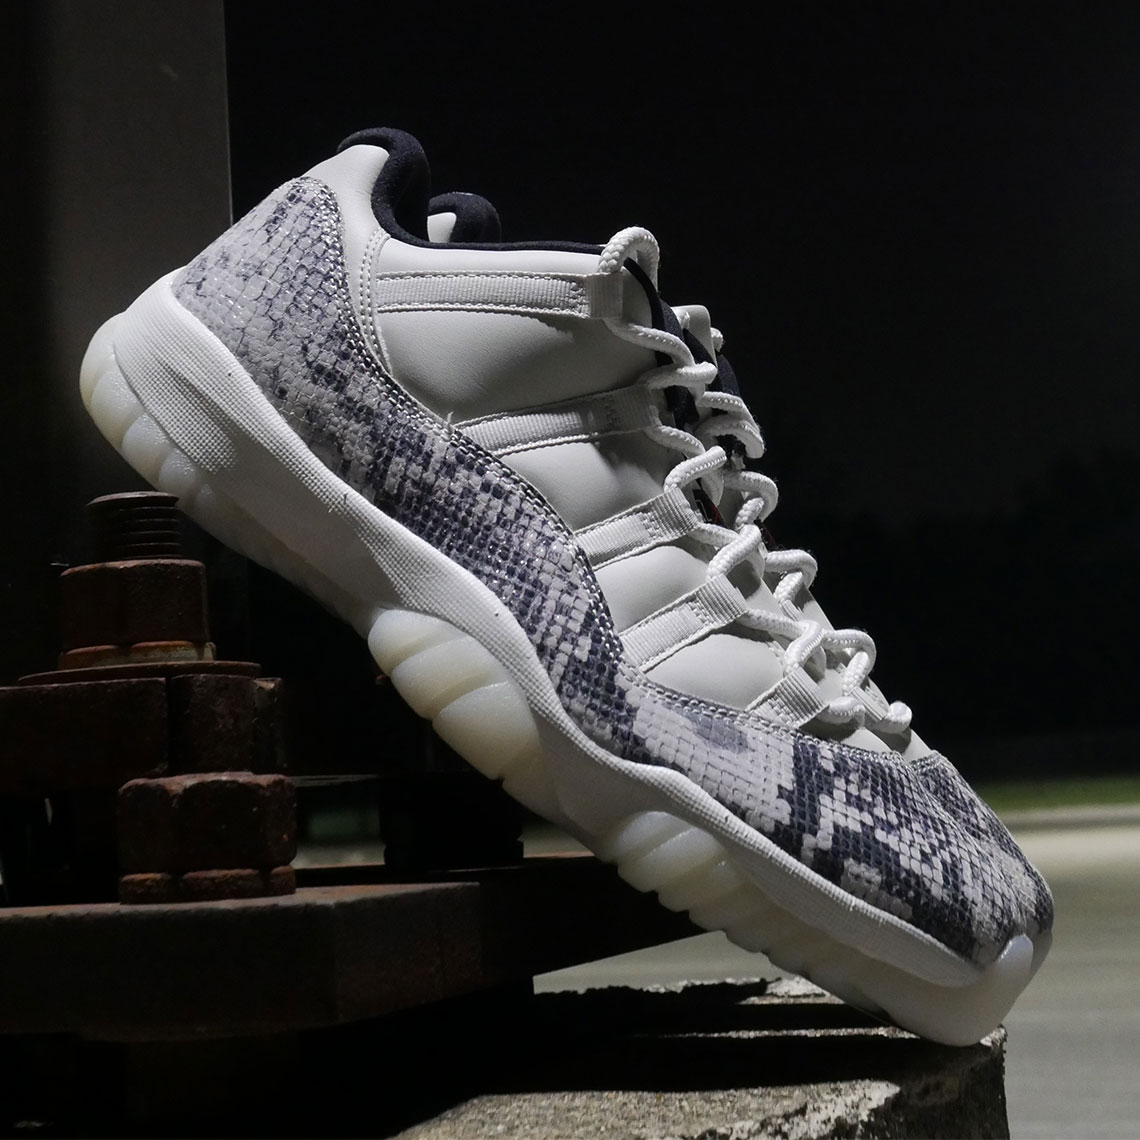 6af8dcb69fb Air Jordan 11 Low LE Snakeskin CD6846-002 Release Date | SneakerNews.com